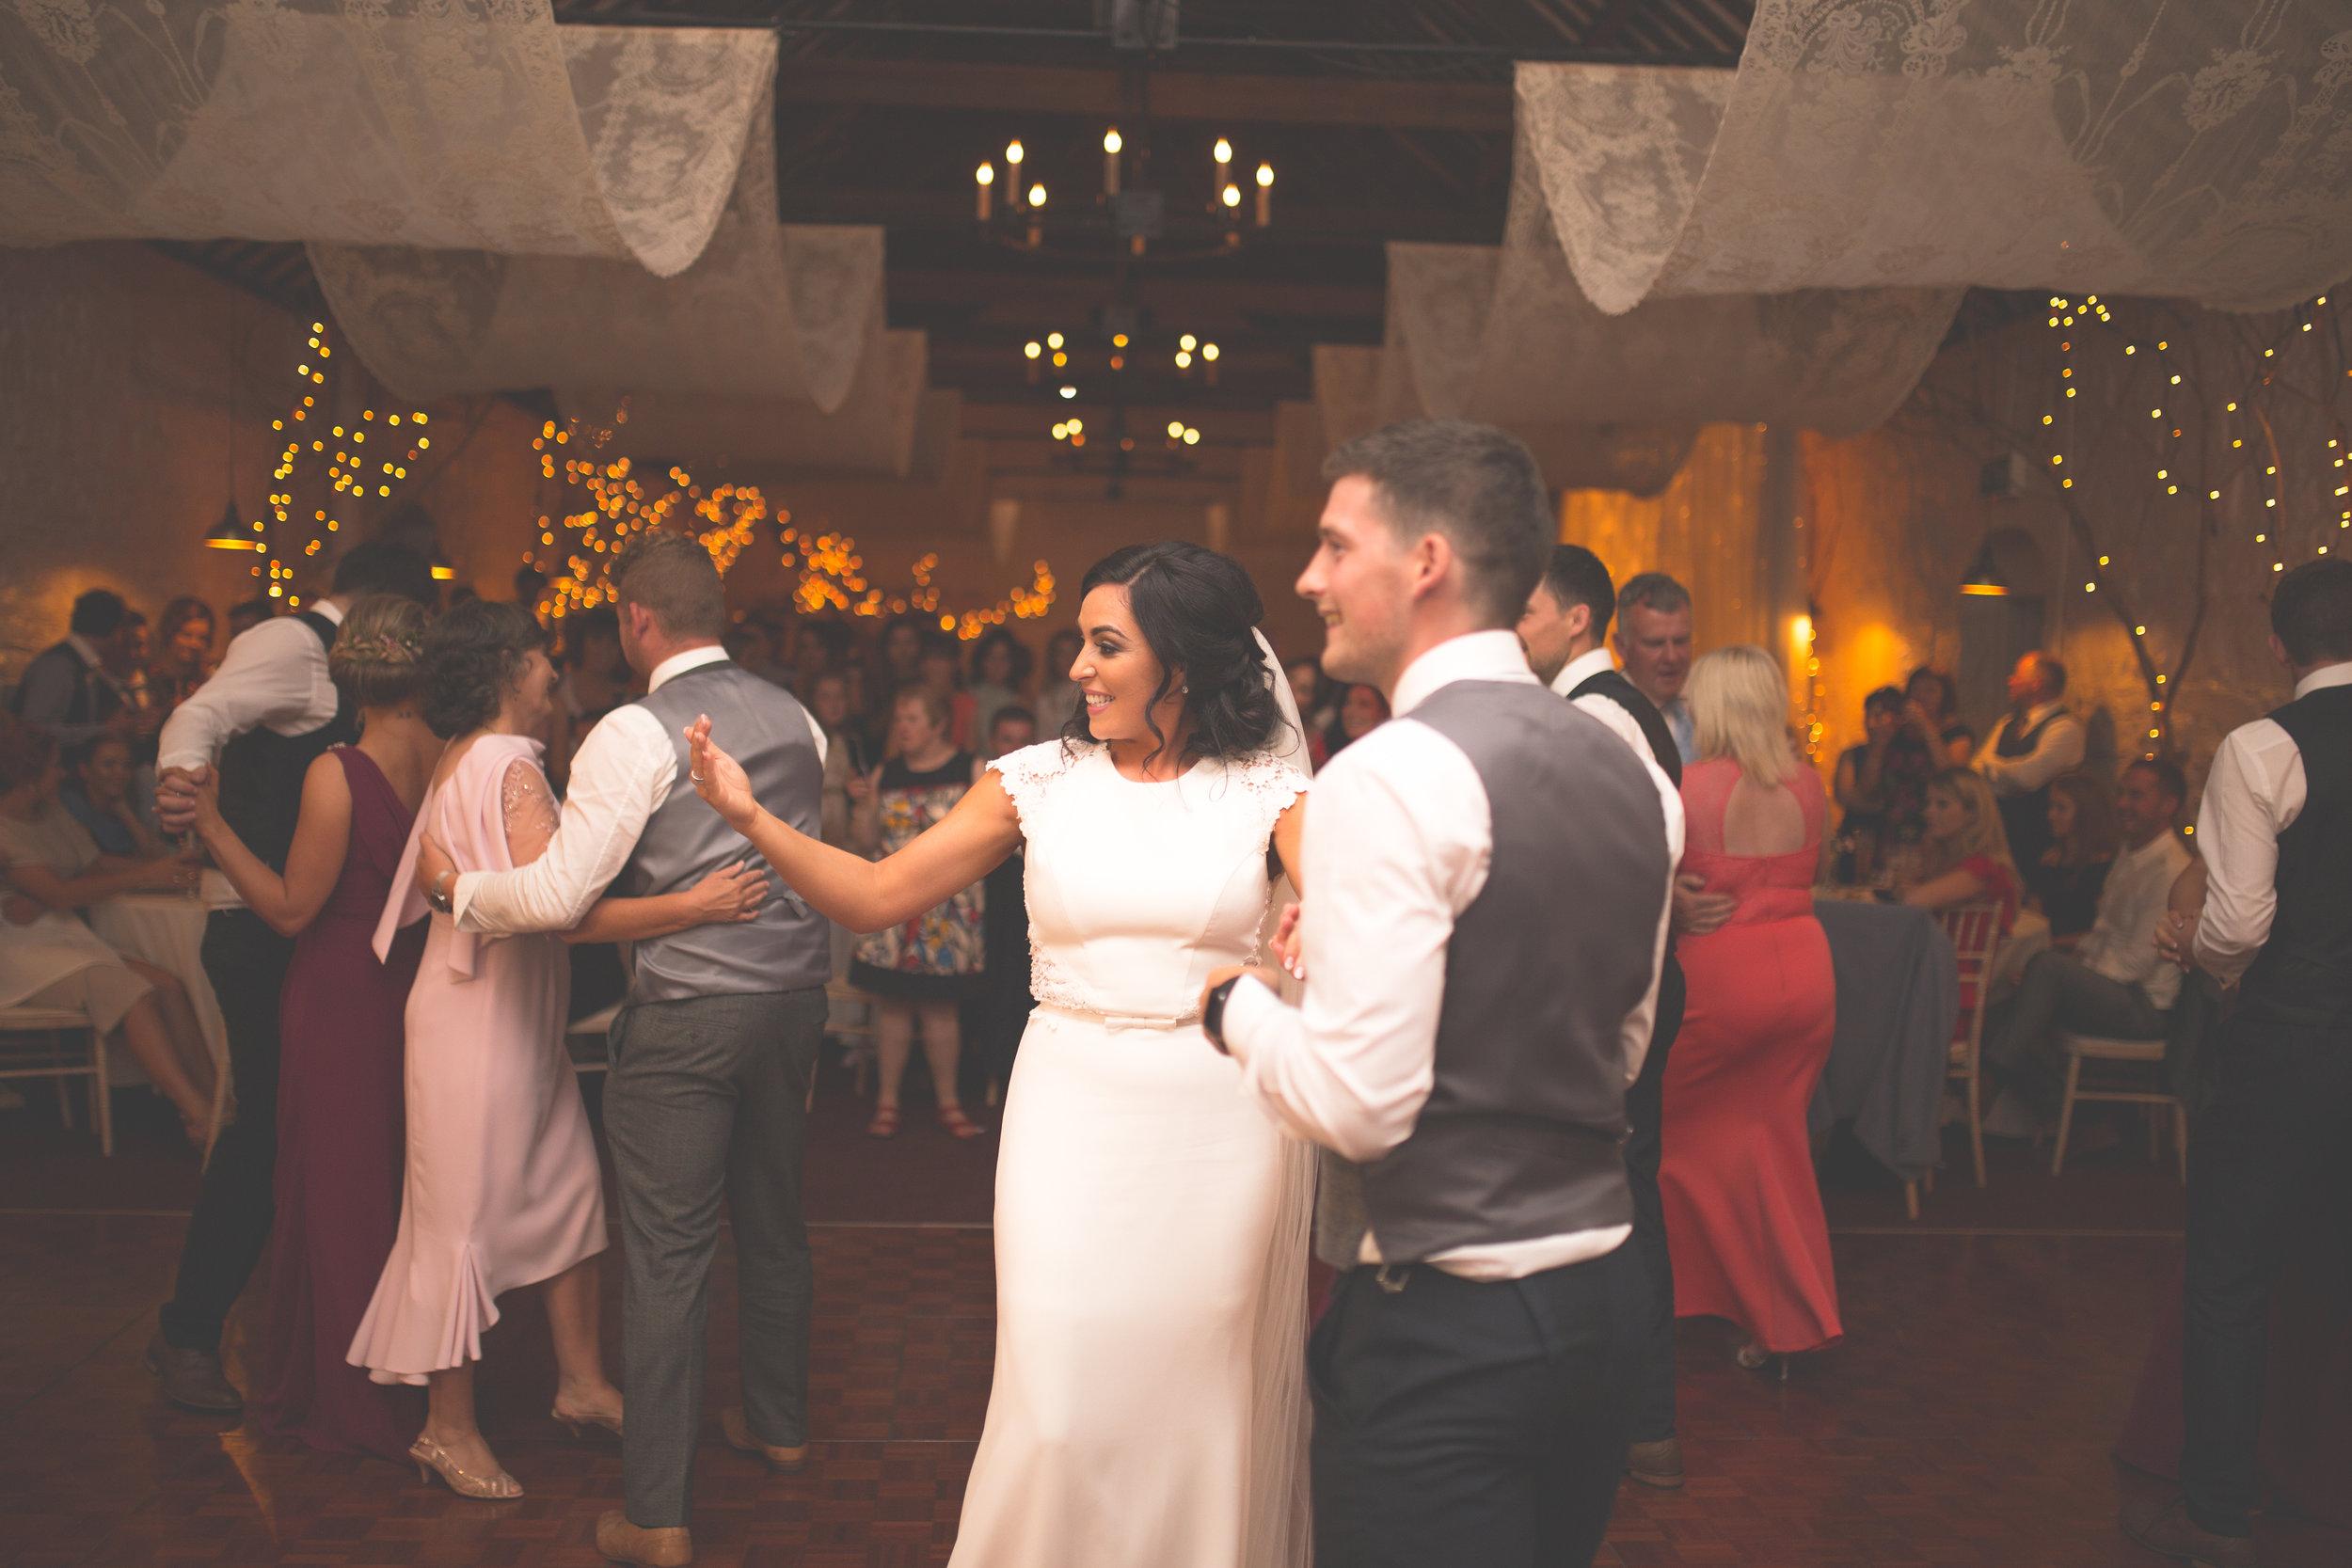 Brian McEwan Wedding Photography | Carol-Annee & Sean | The Dancing-49.jpg